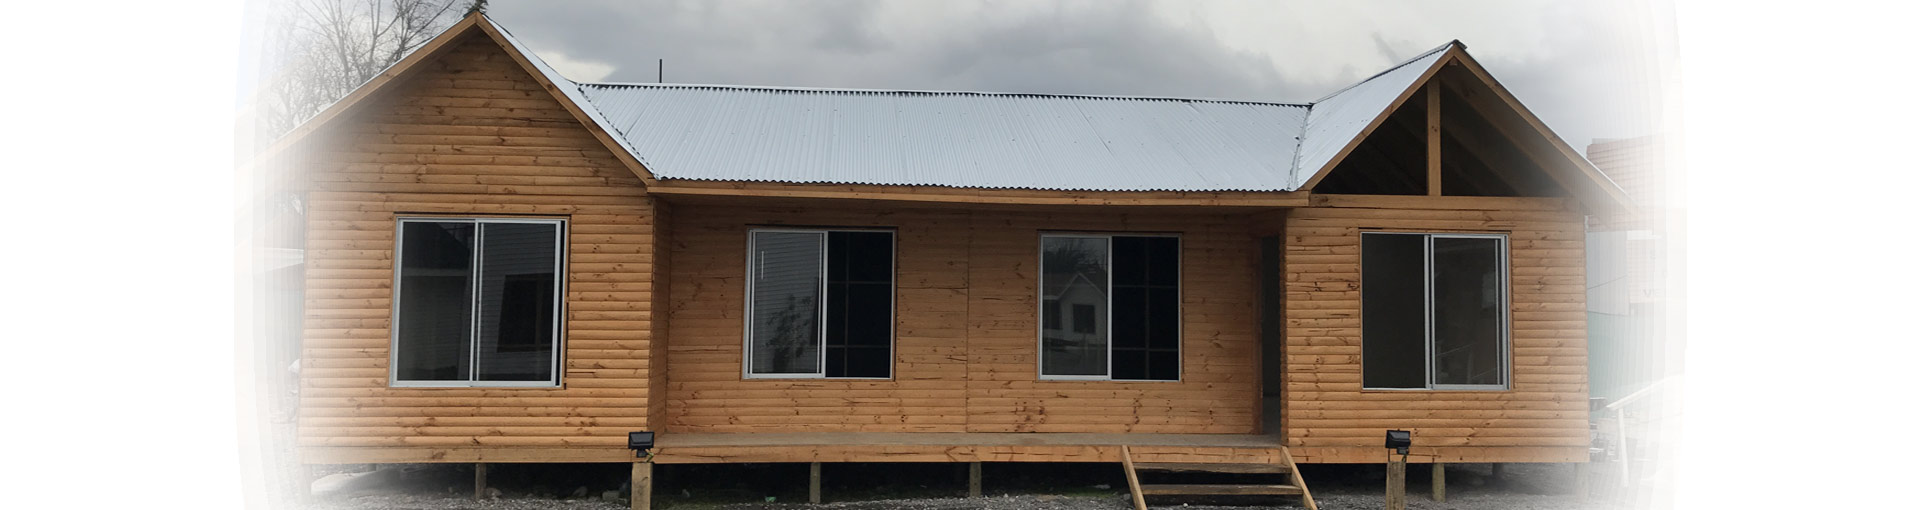 Venta de casas prefabricadas por paneles